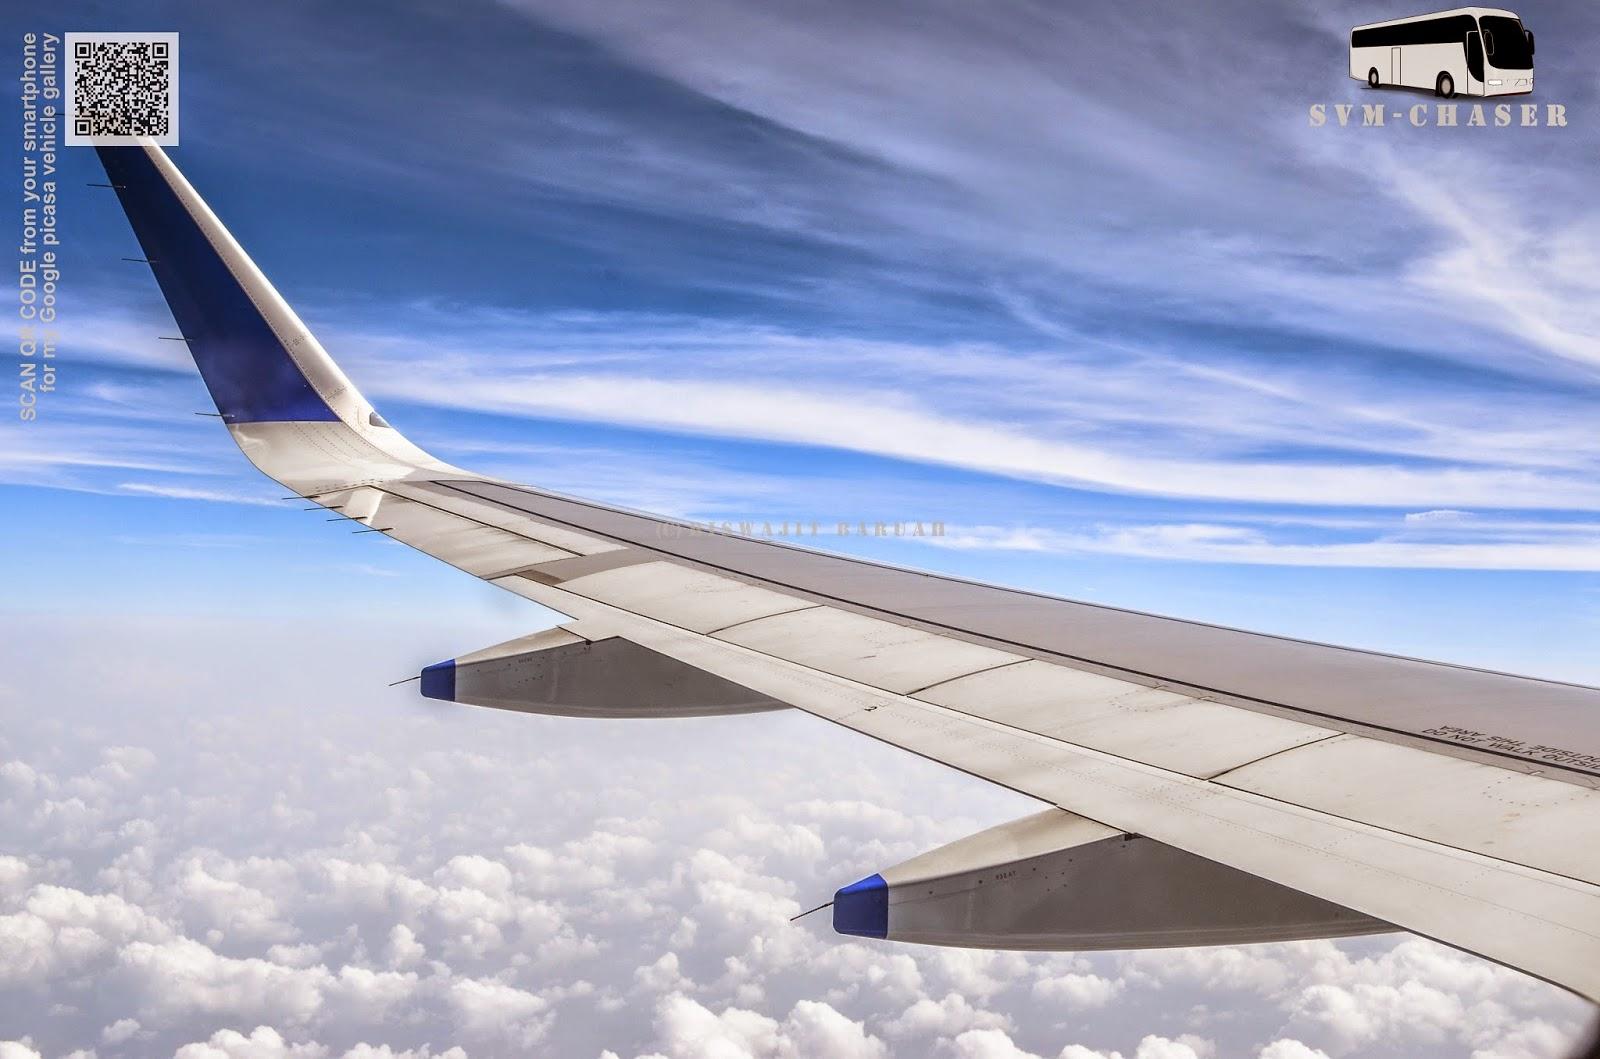 indigo airlines Indigo(インディゴ)は2006年に運航を開始したインドの航空会社で設立数年で急成長し、2017年現在、インドの航空市場の最大シェアを有する航空会社となっている。.